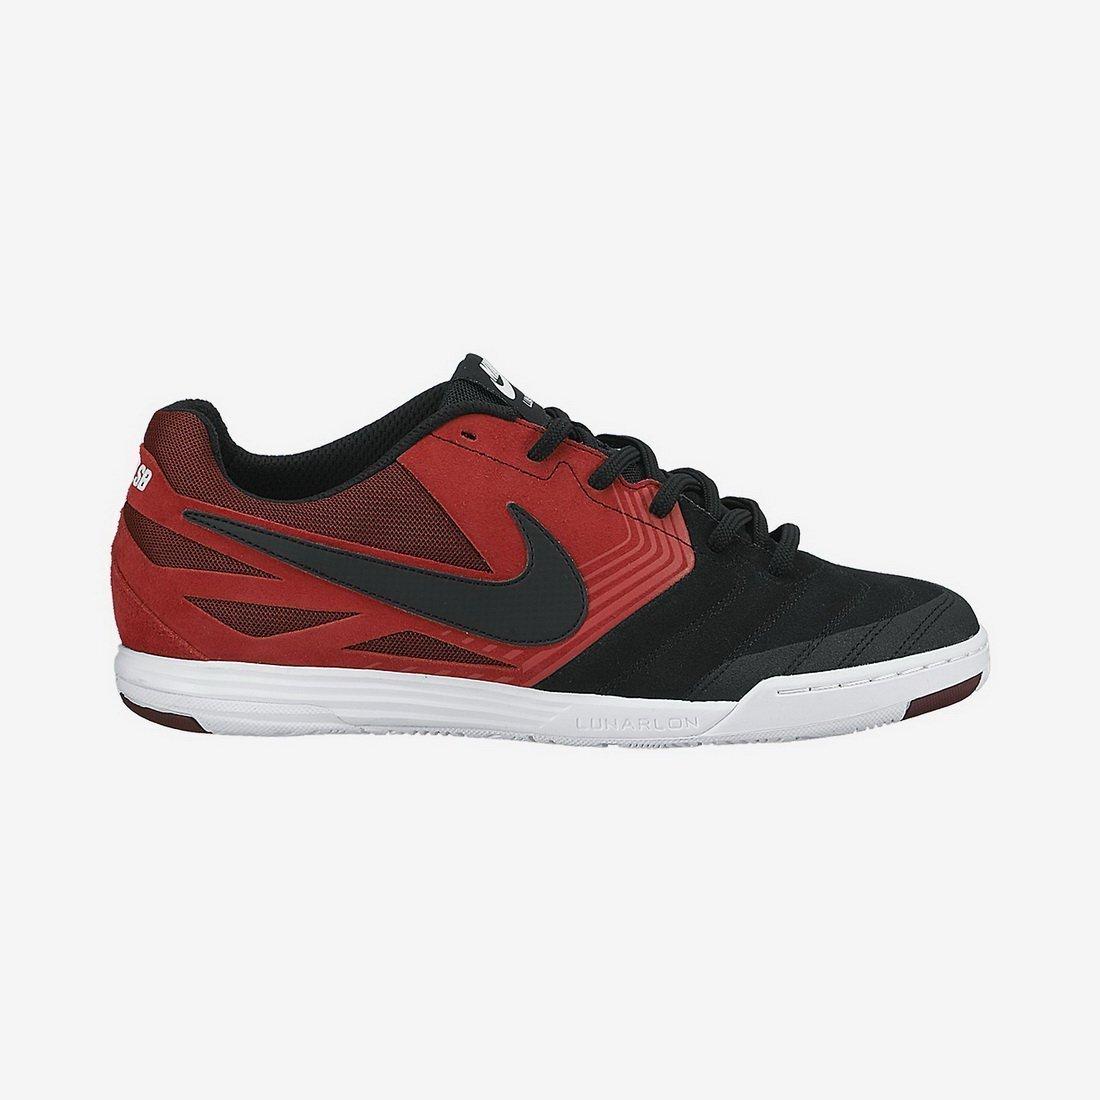 0c9b1018d promo code for nike sb lunar gato mens sneakers 616484 601 6764a b4634